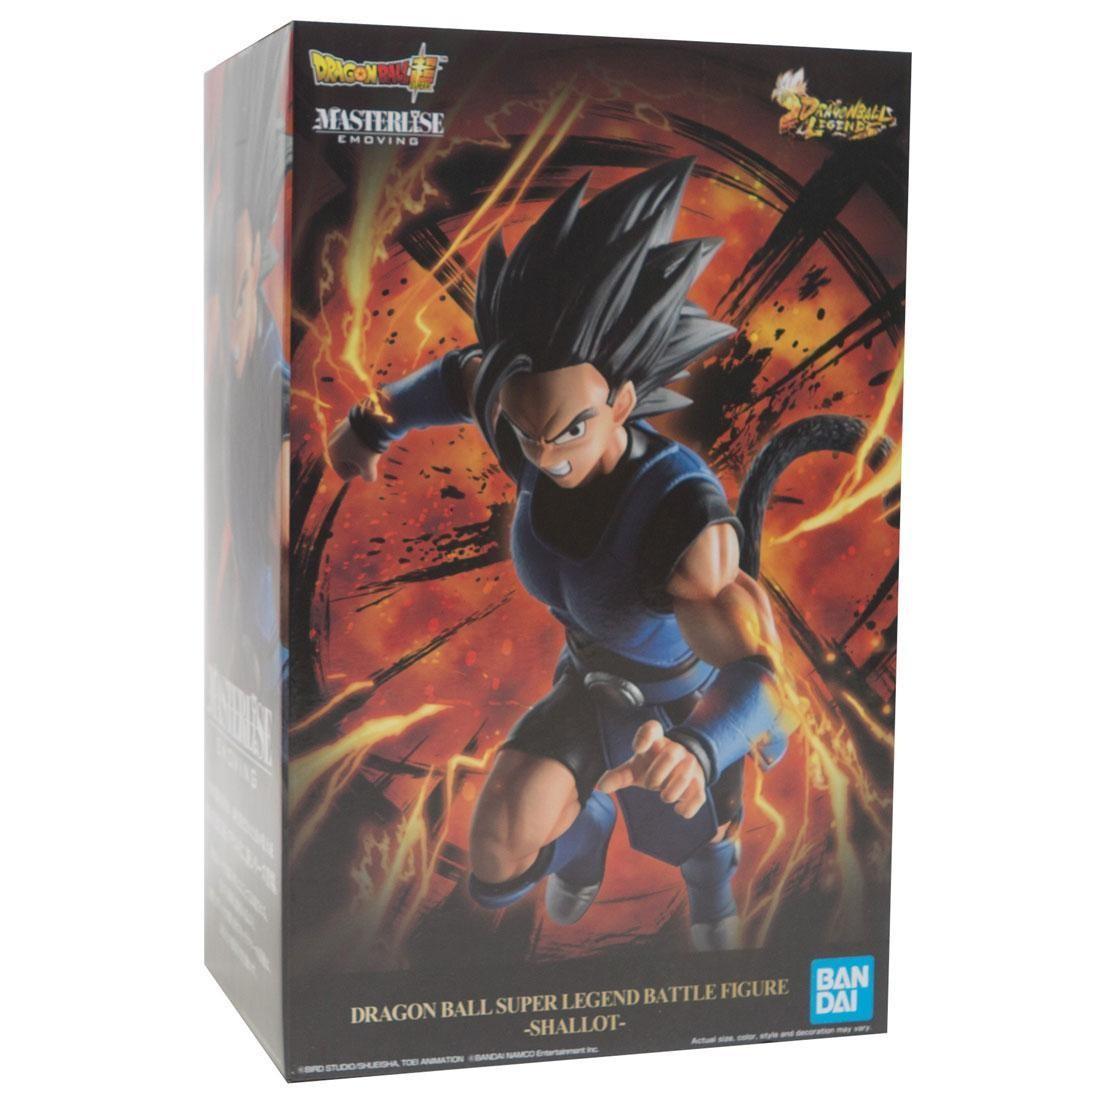 Banpresto Dragon Ball Legends Battle Figure Masterlise Emoving Shallot